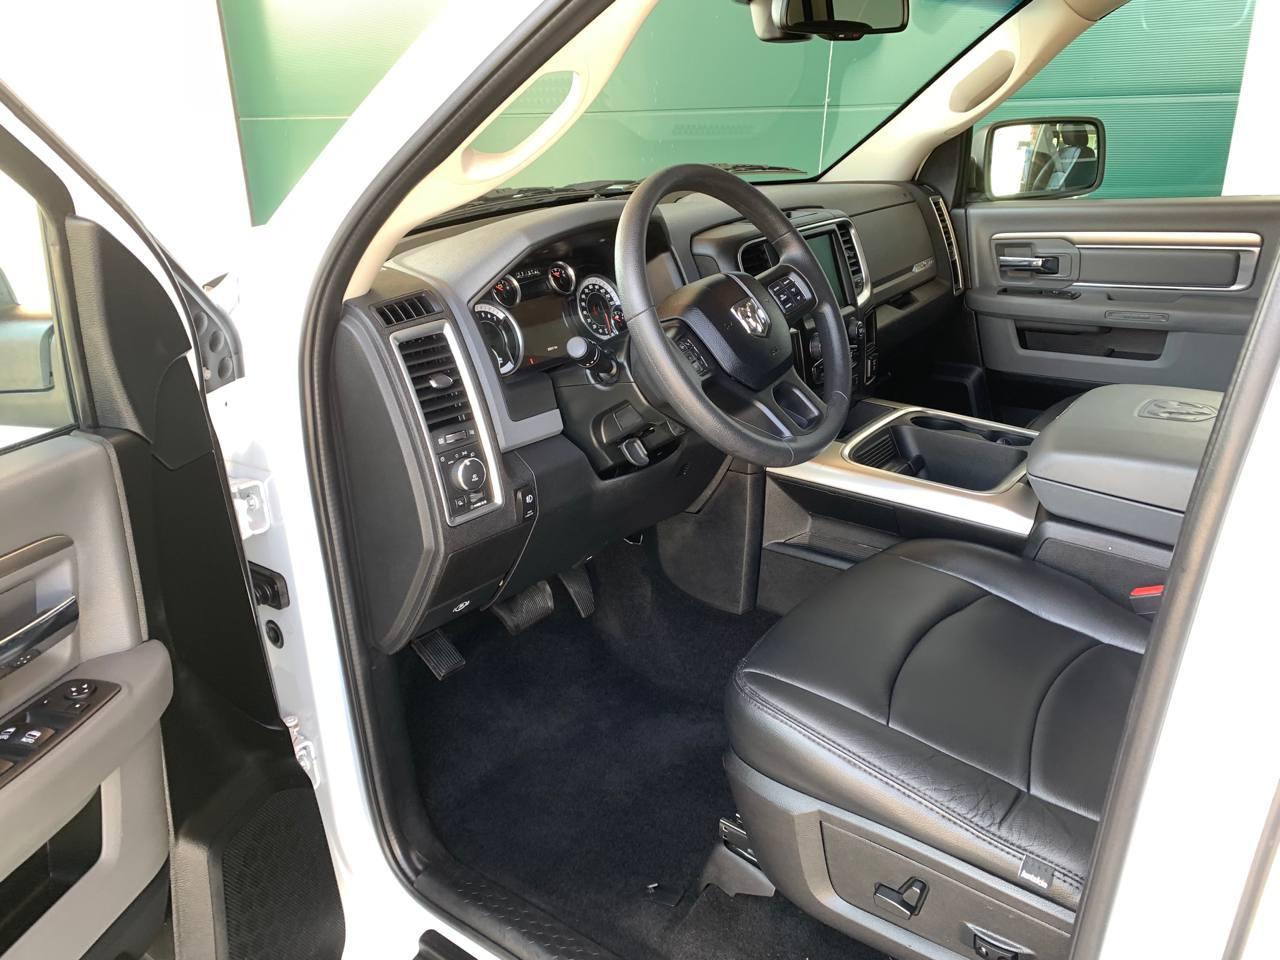 2017 Dodge Ram 1500 vendre